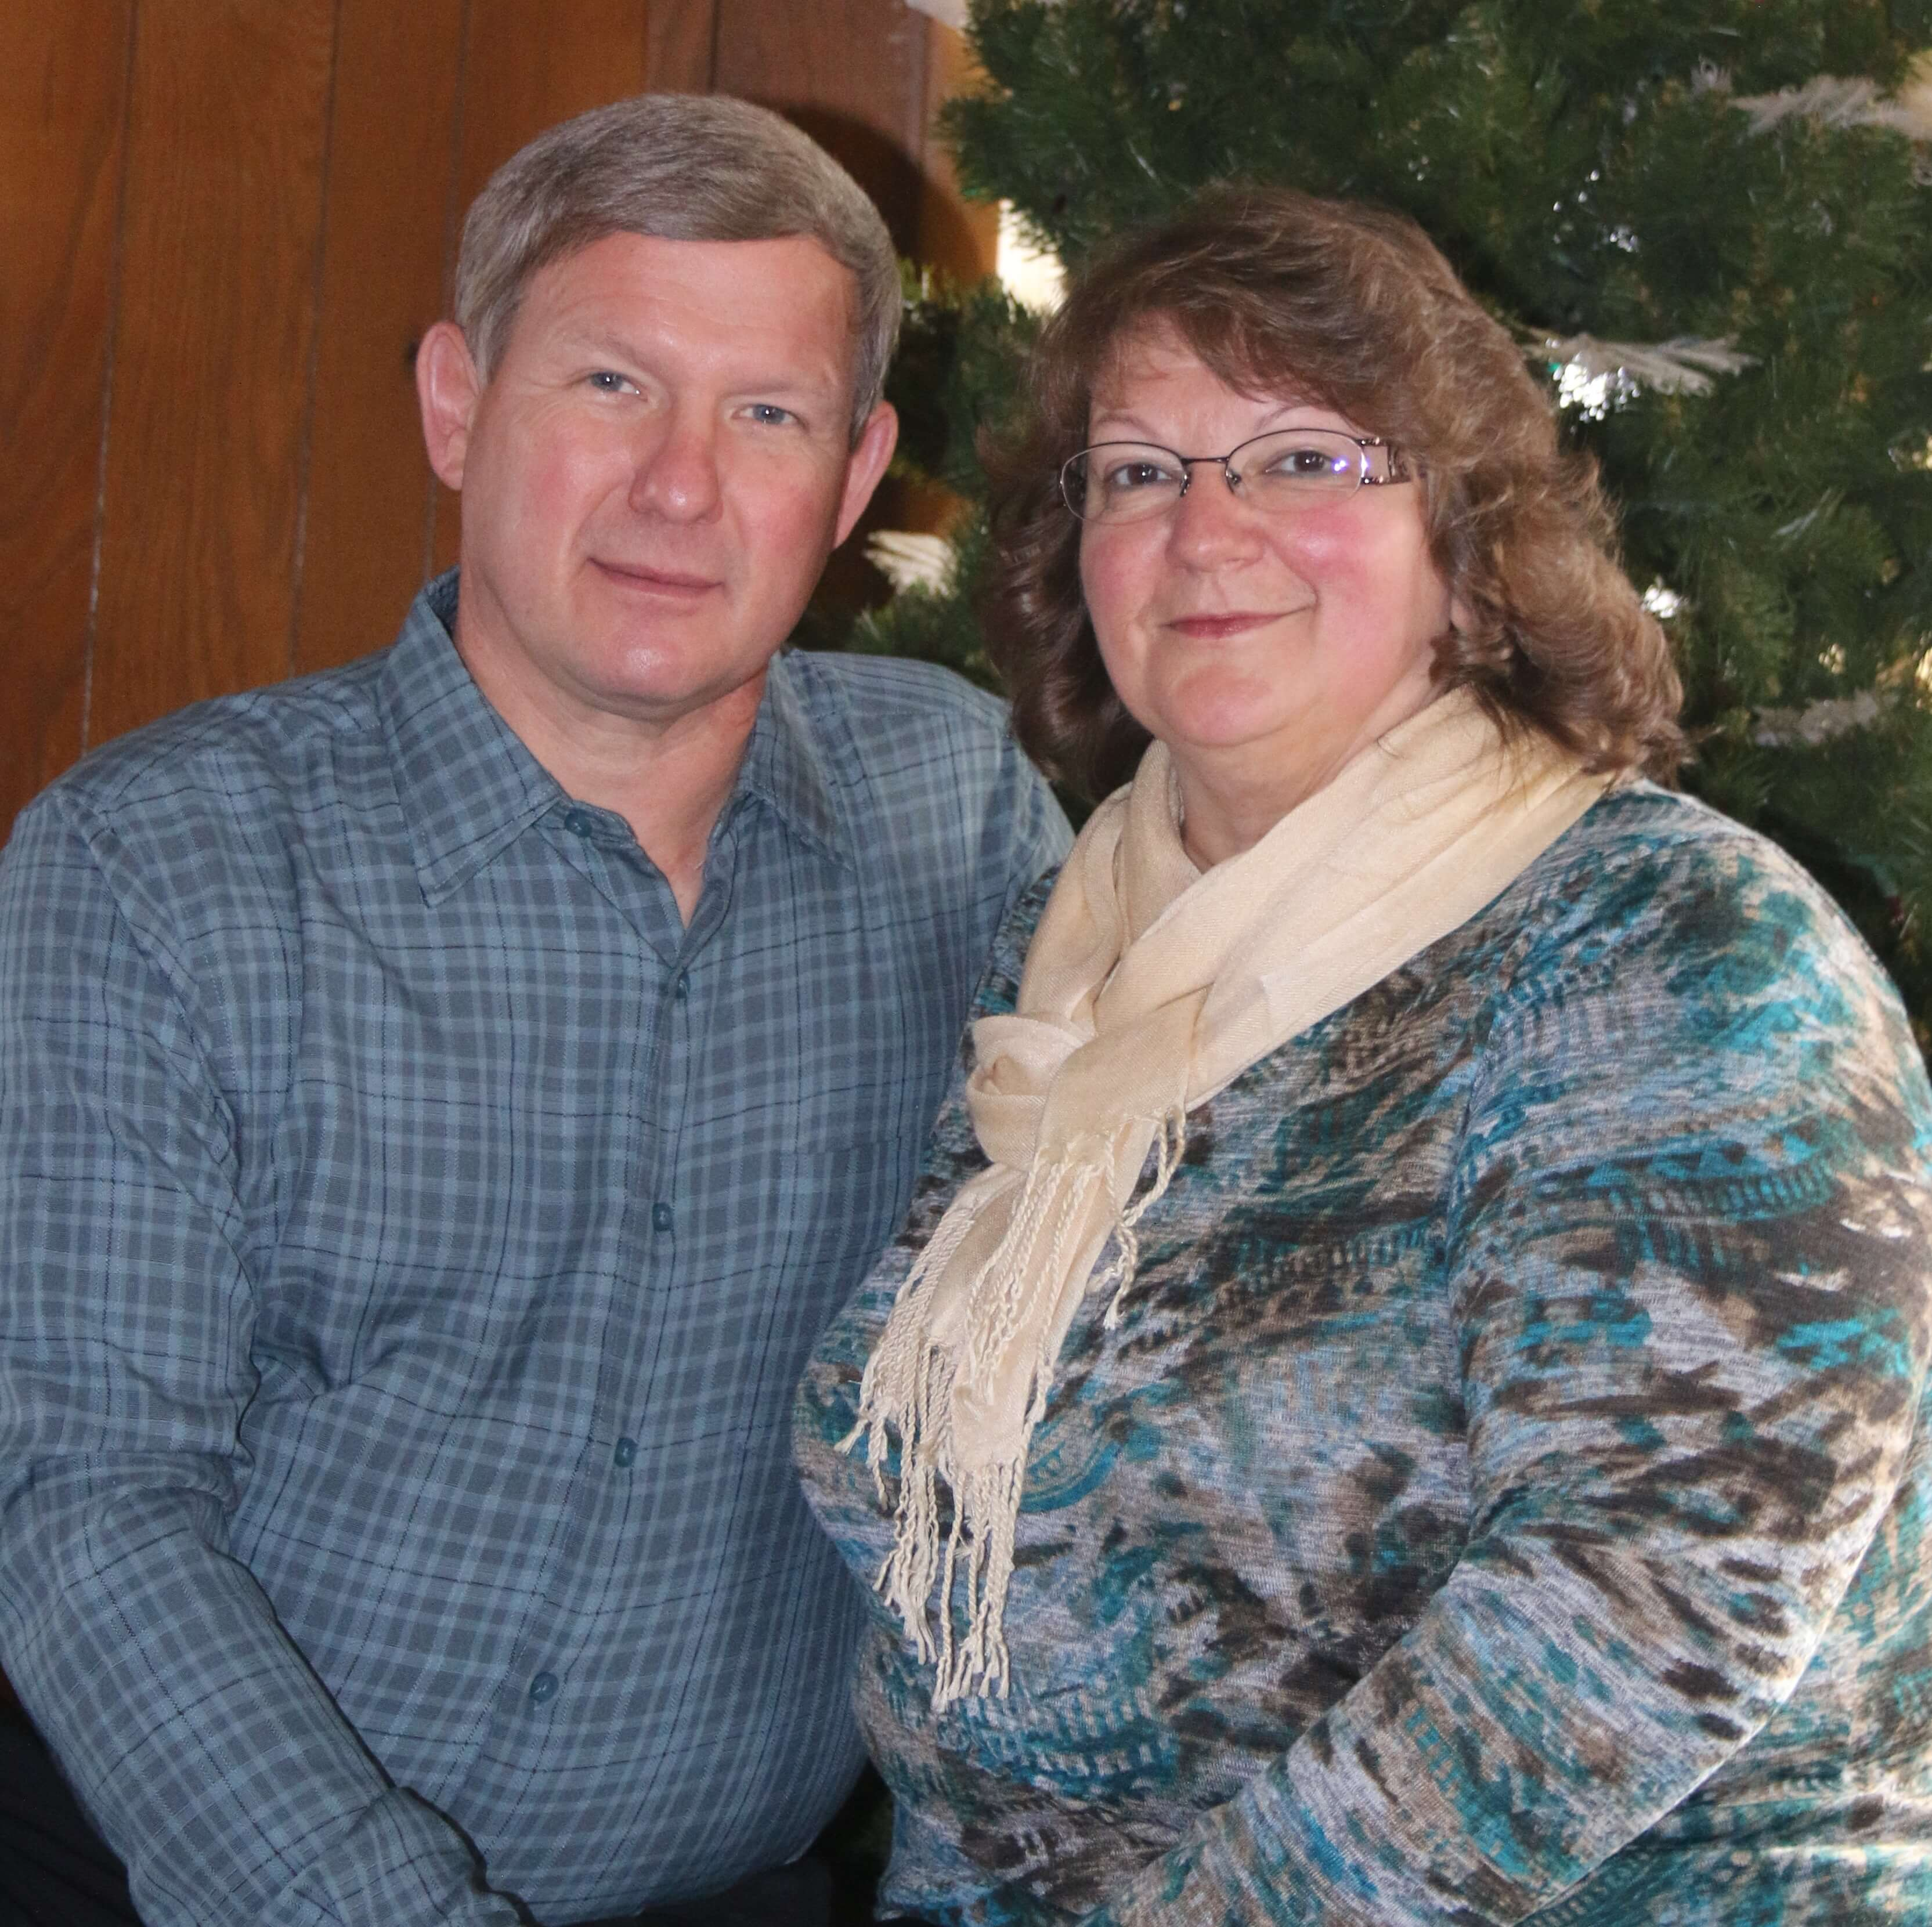 Jeff & Tammy Hierholzer